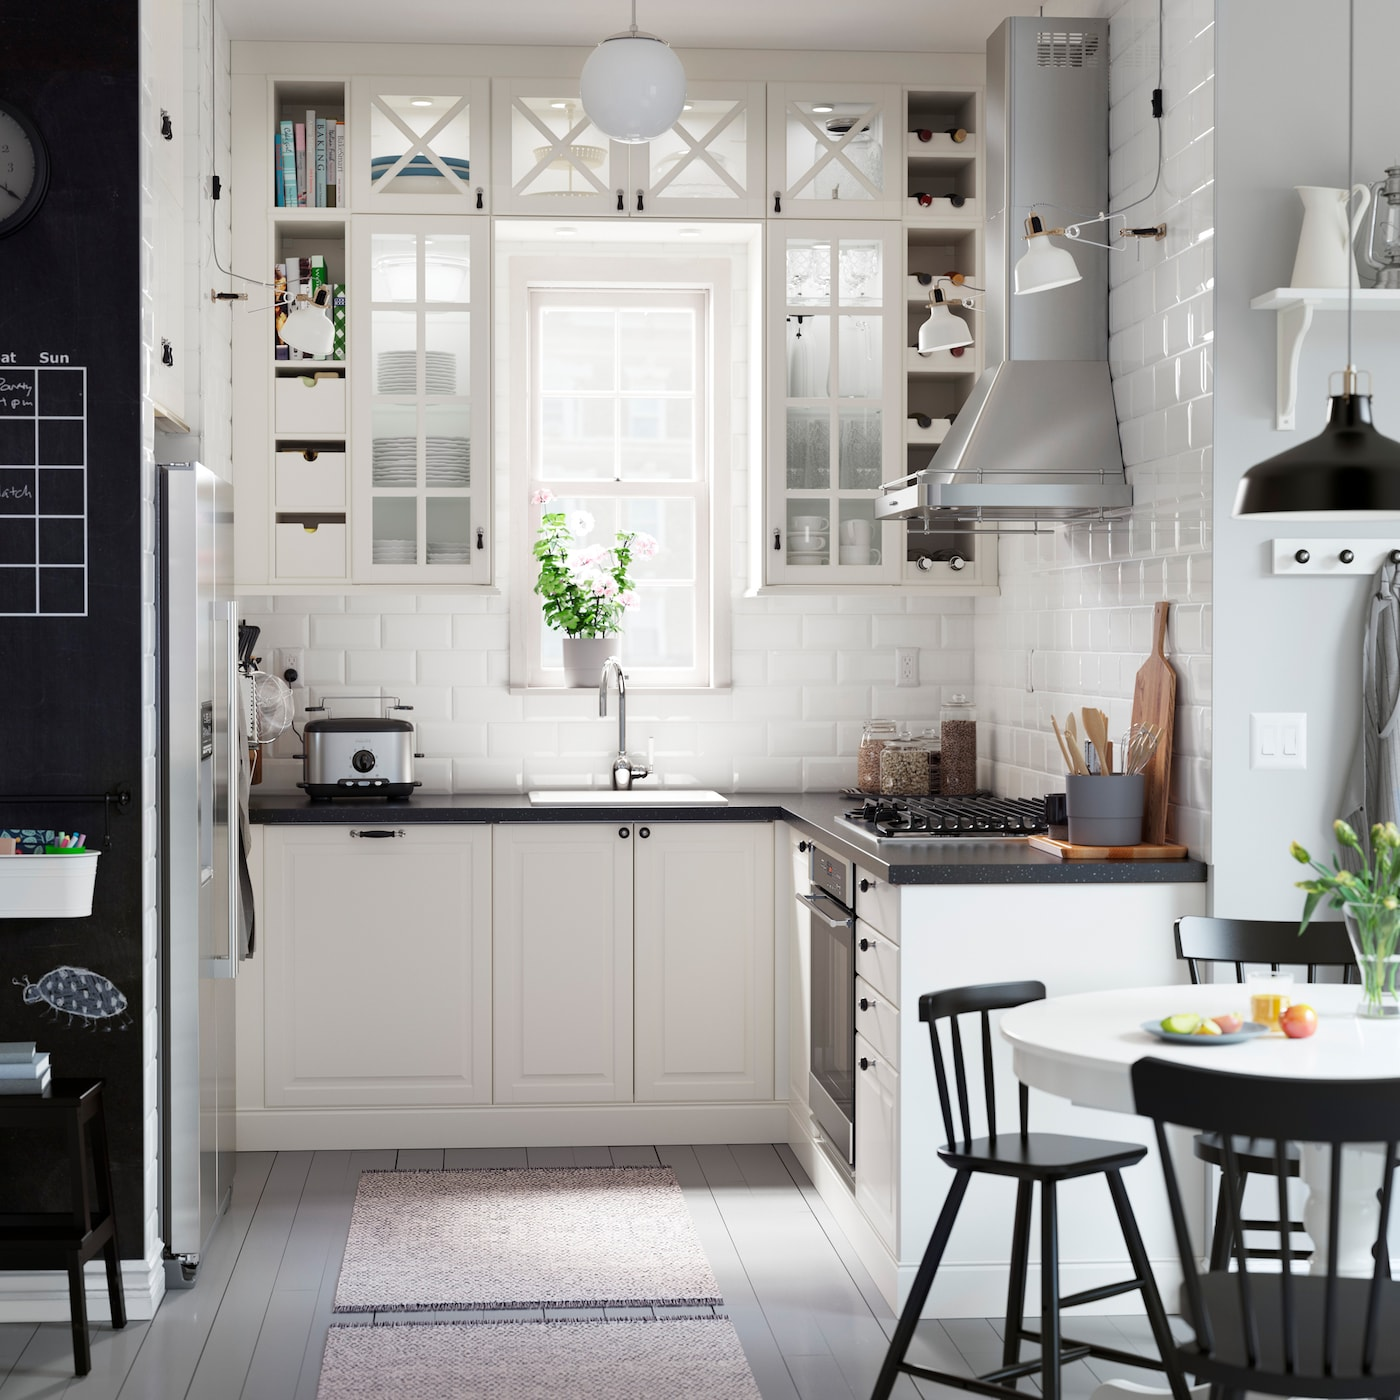 Customize your kitchen storage - IKEA